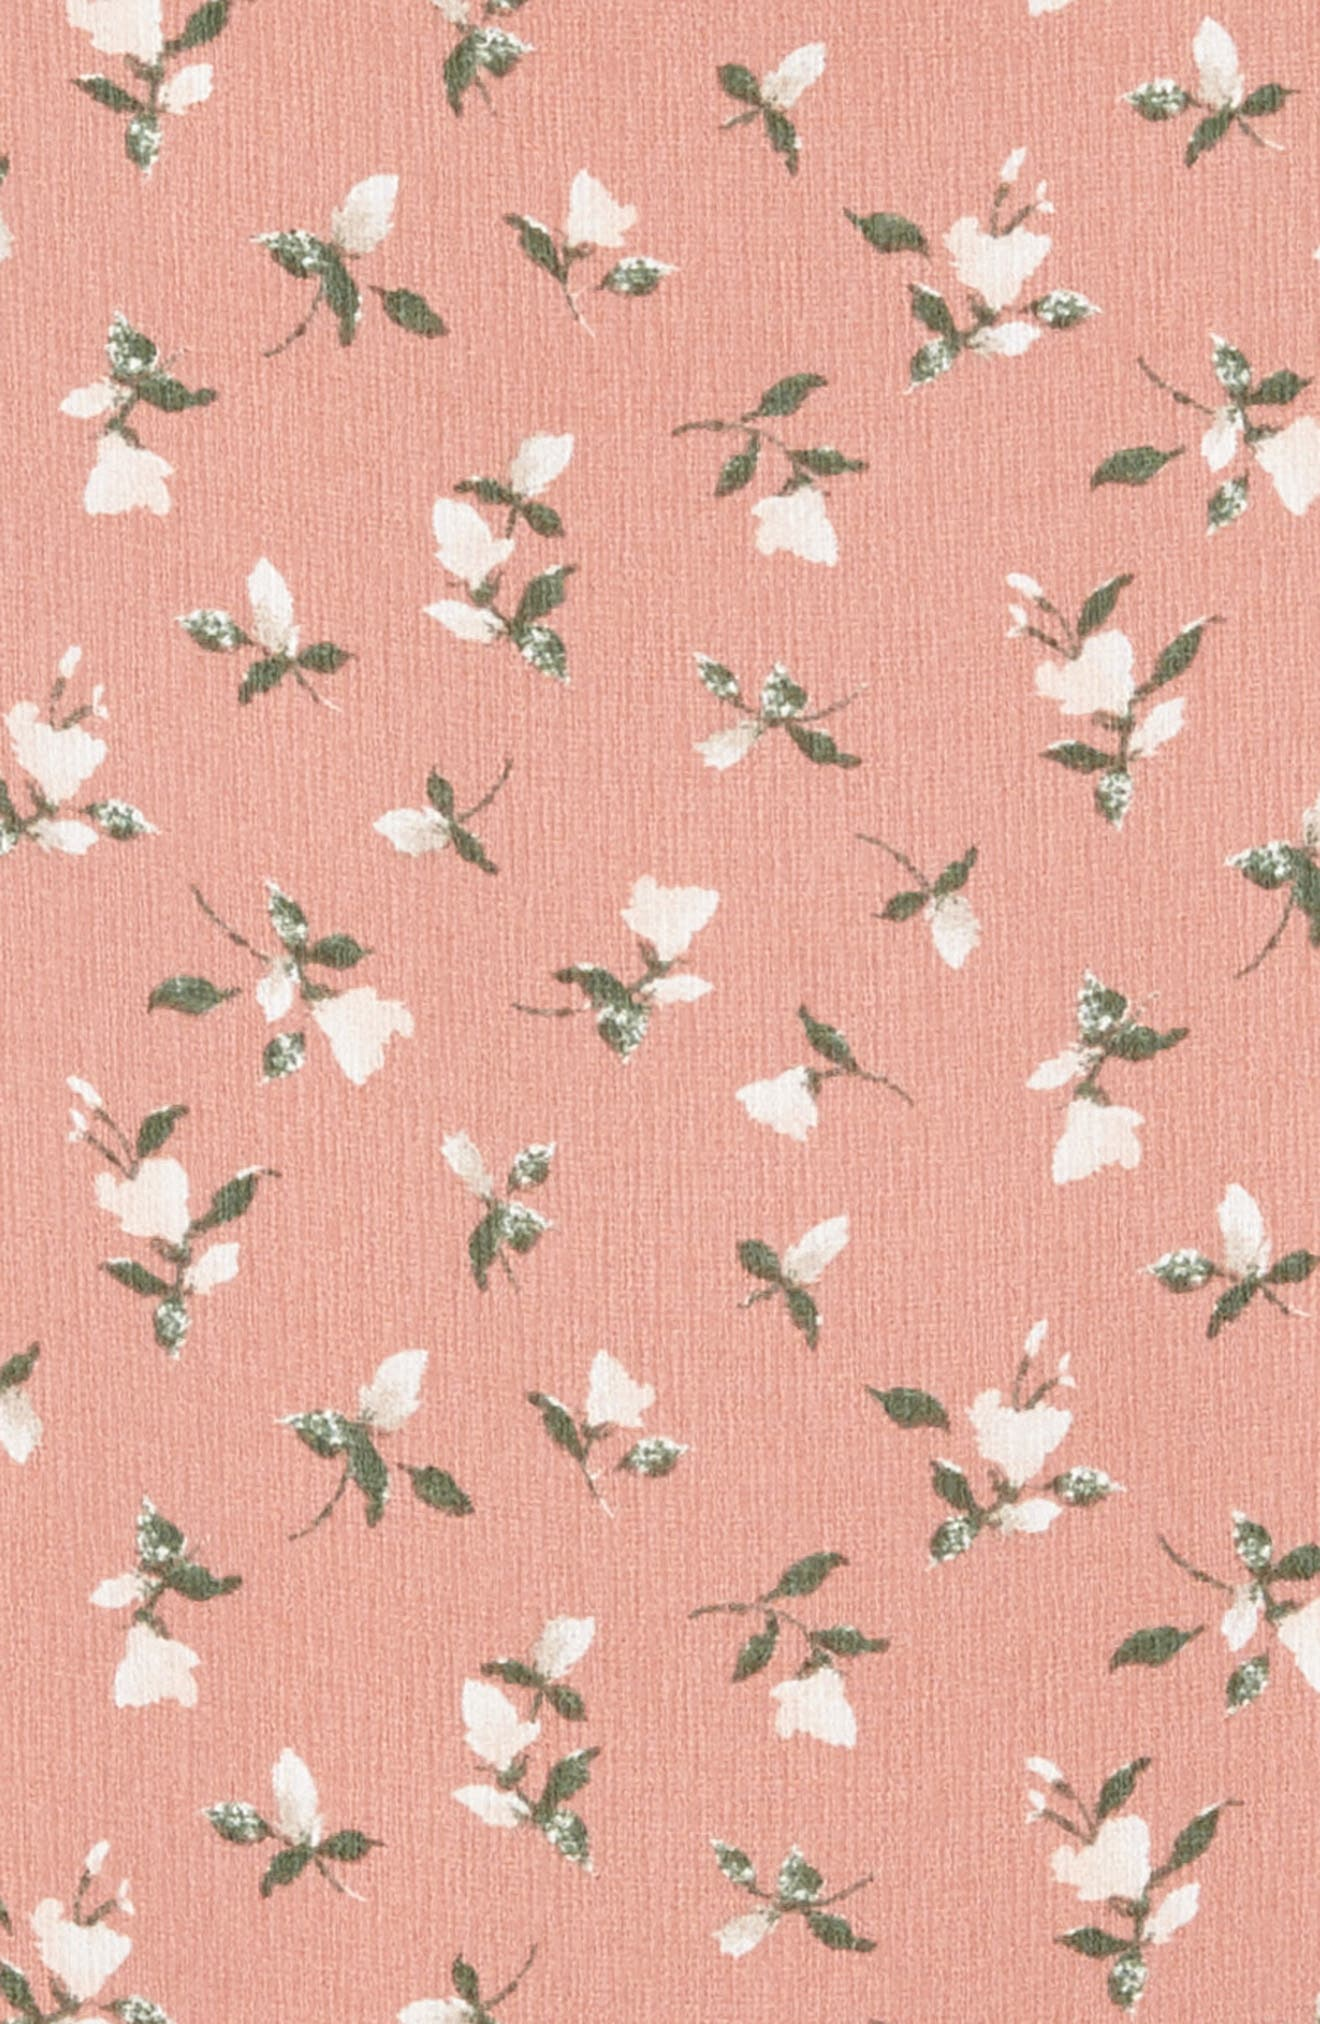 Floral Print Sundress,                             Alternate thumbnail 3, color,                             Pink